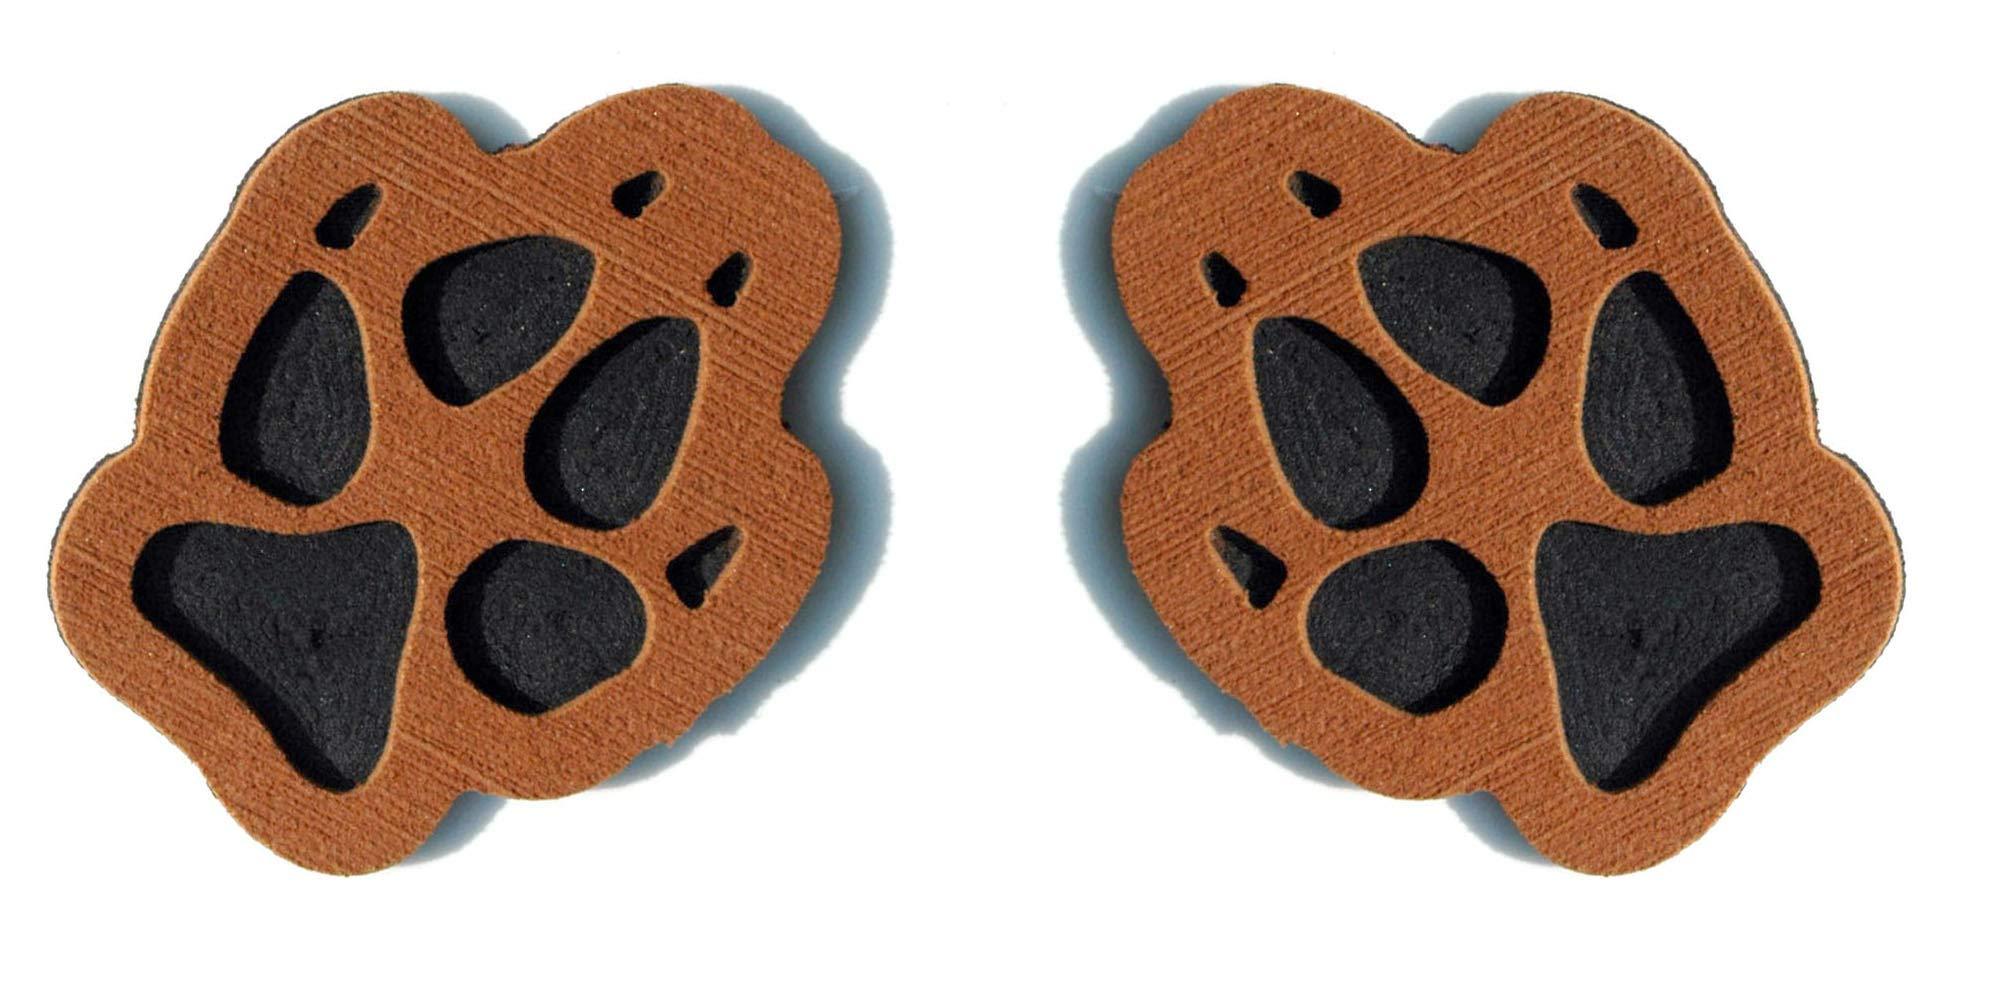 Toejamr Snowboard Stomp Pad - 2 Puppy Paws - Brown